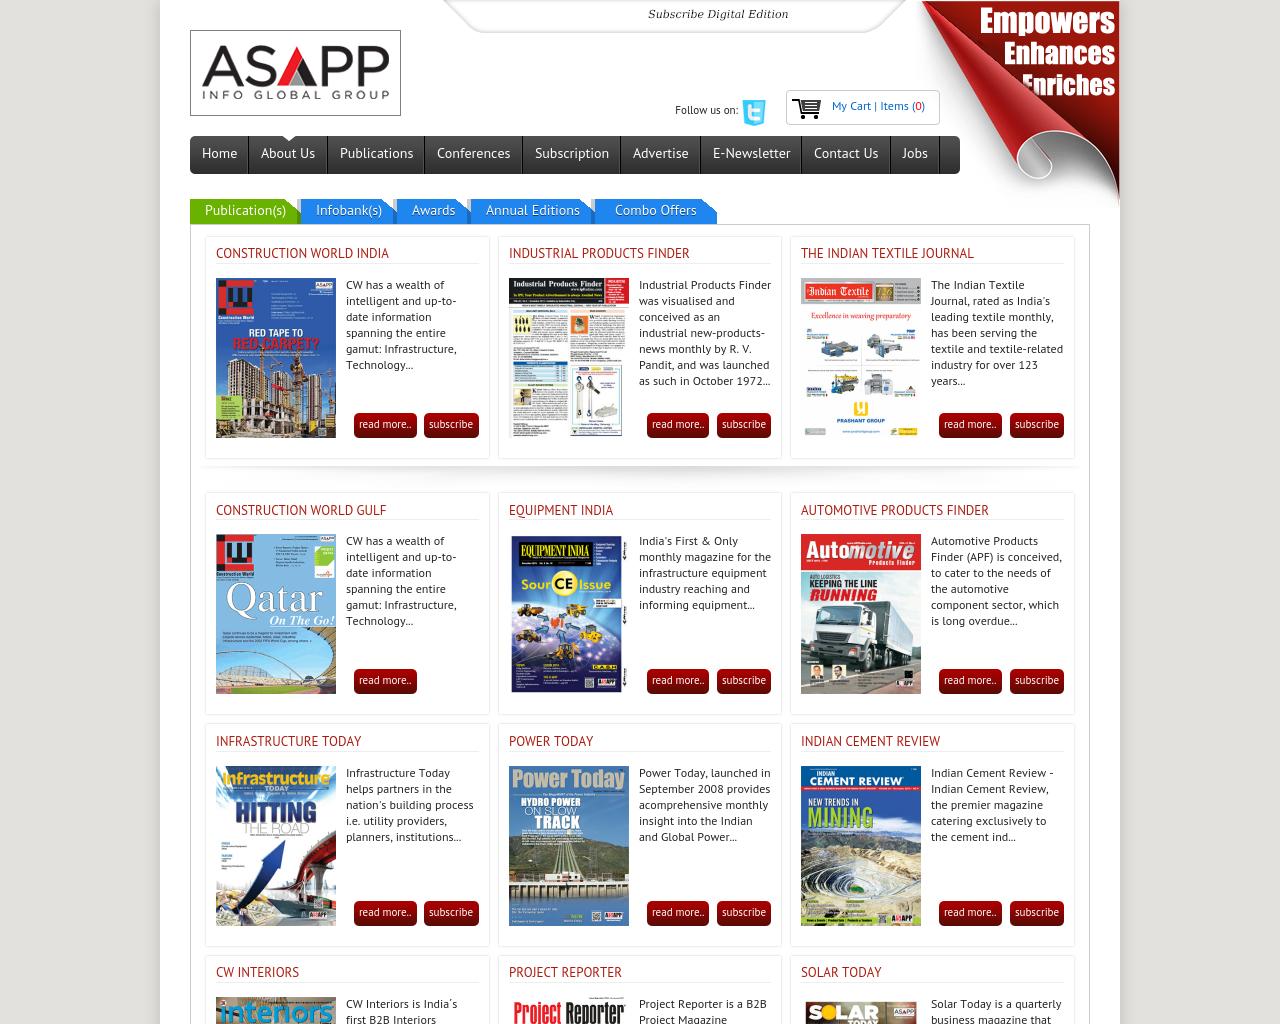 ASAPP-Media-Information-Group-Advertising-Reviews-Pricing